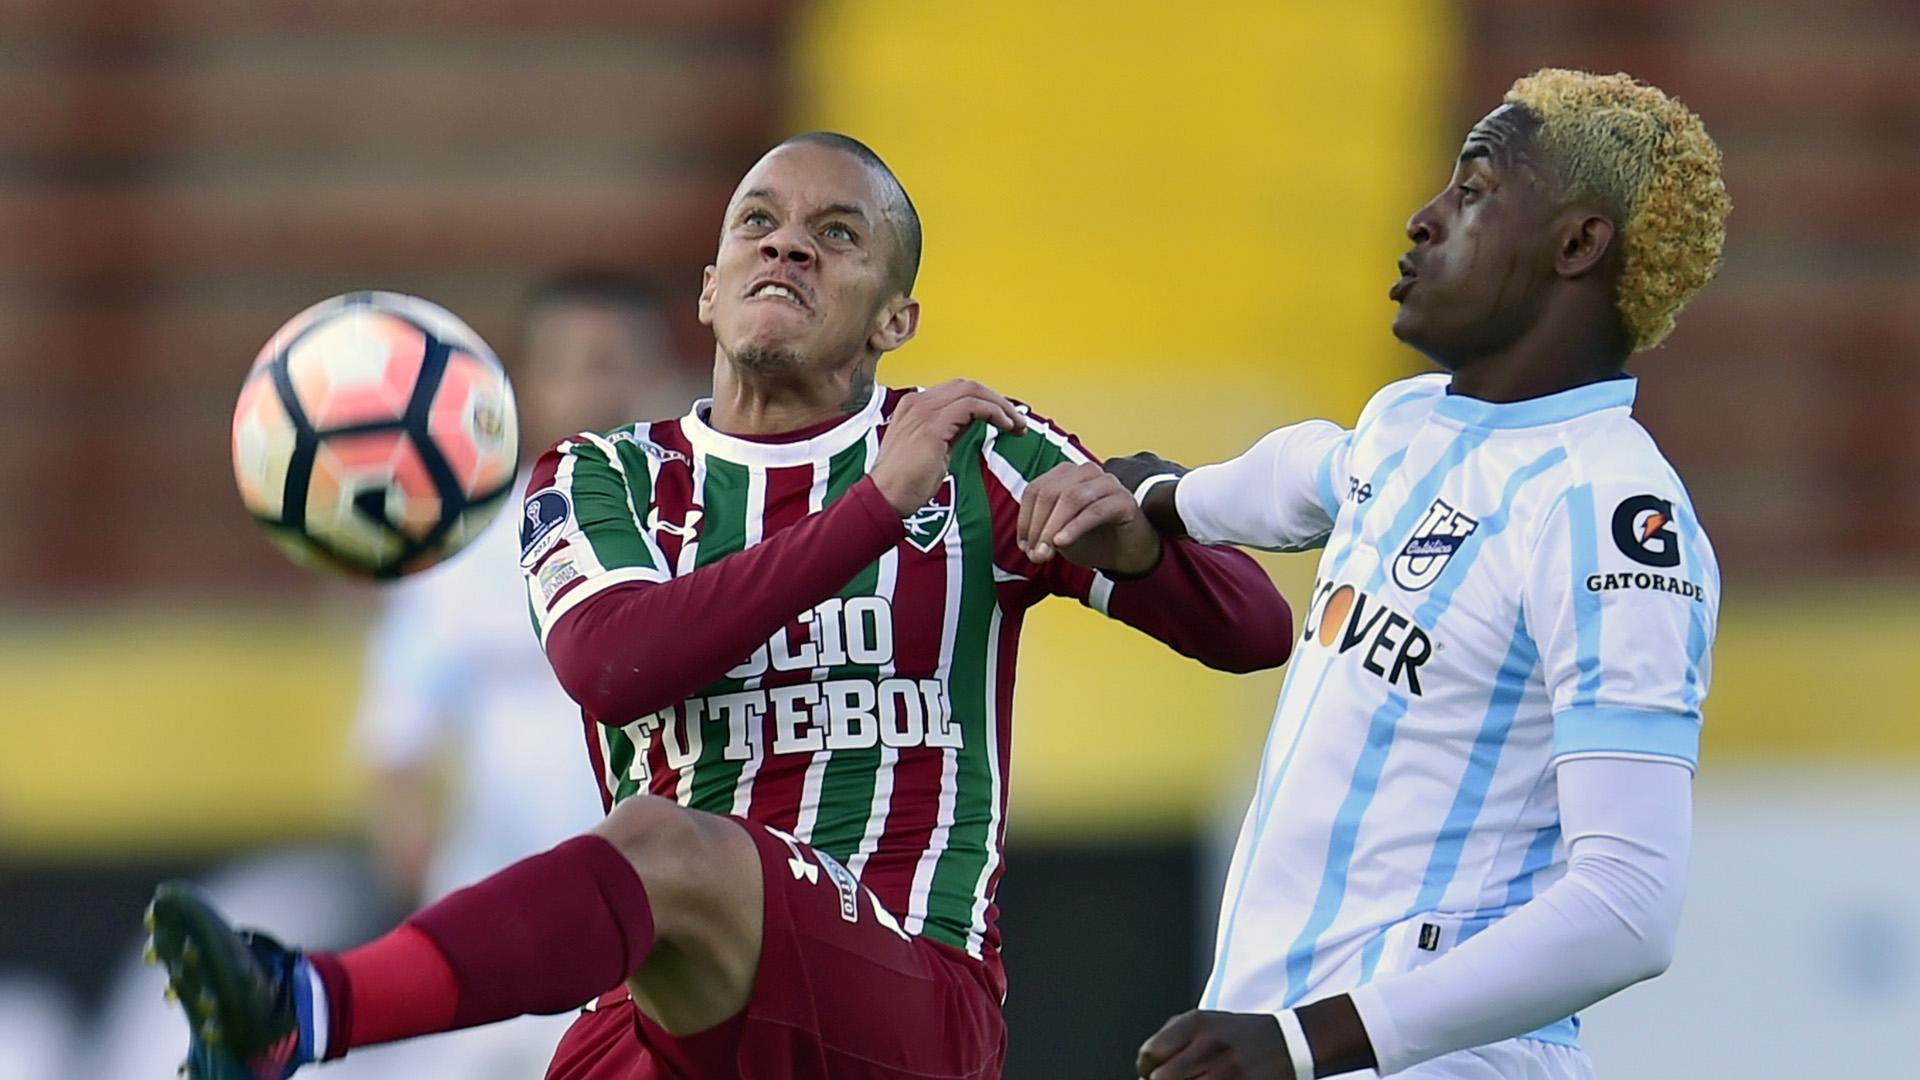 Marcos Junior Wilmer Meneses Uni Catolica-ECU Fluminense Copa Sudamericana 26072017